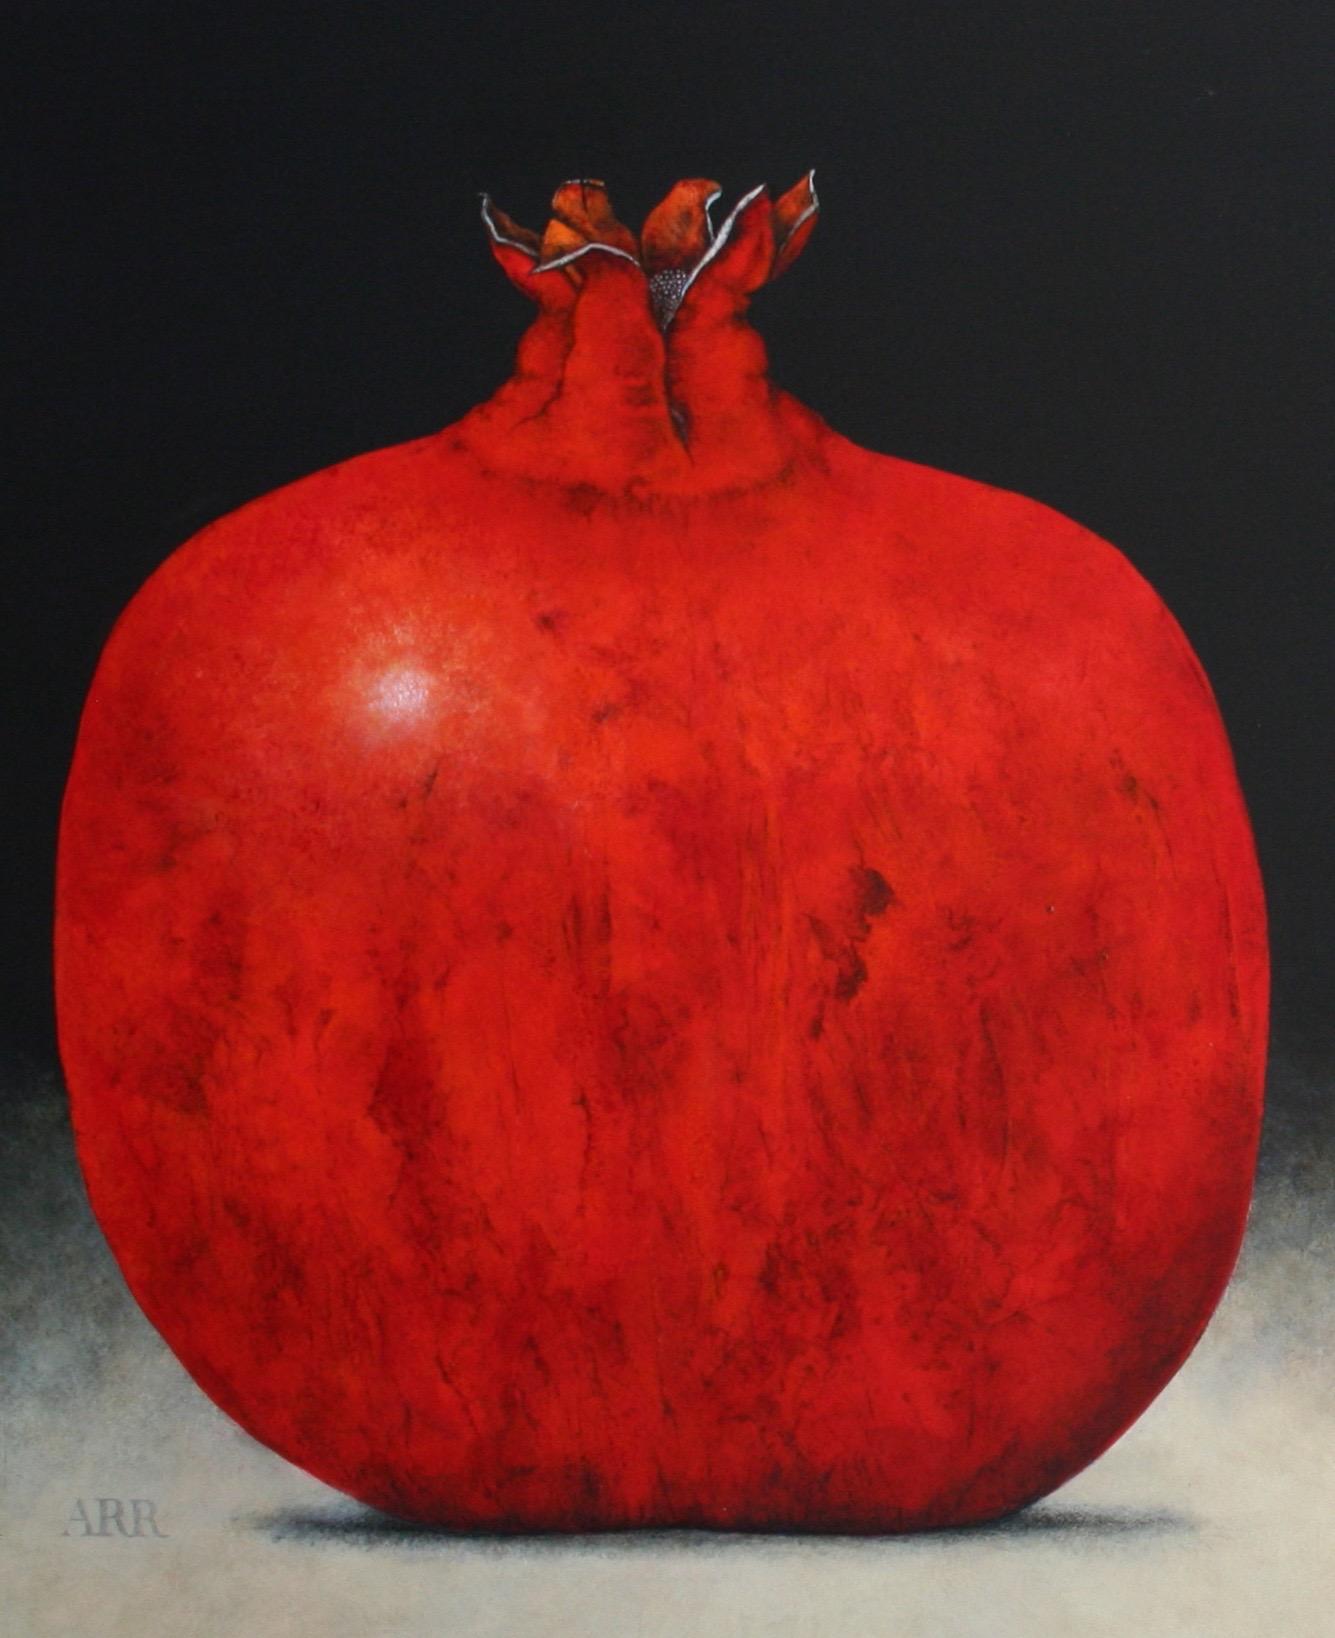 Pomegranate - Large